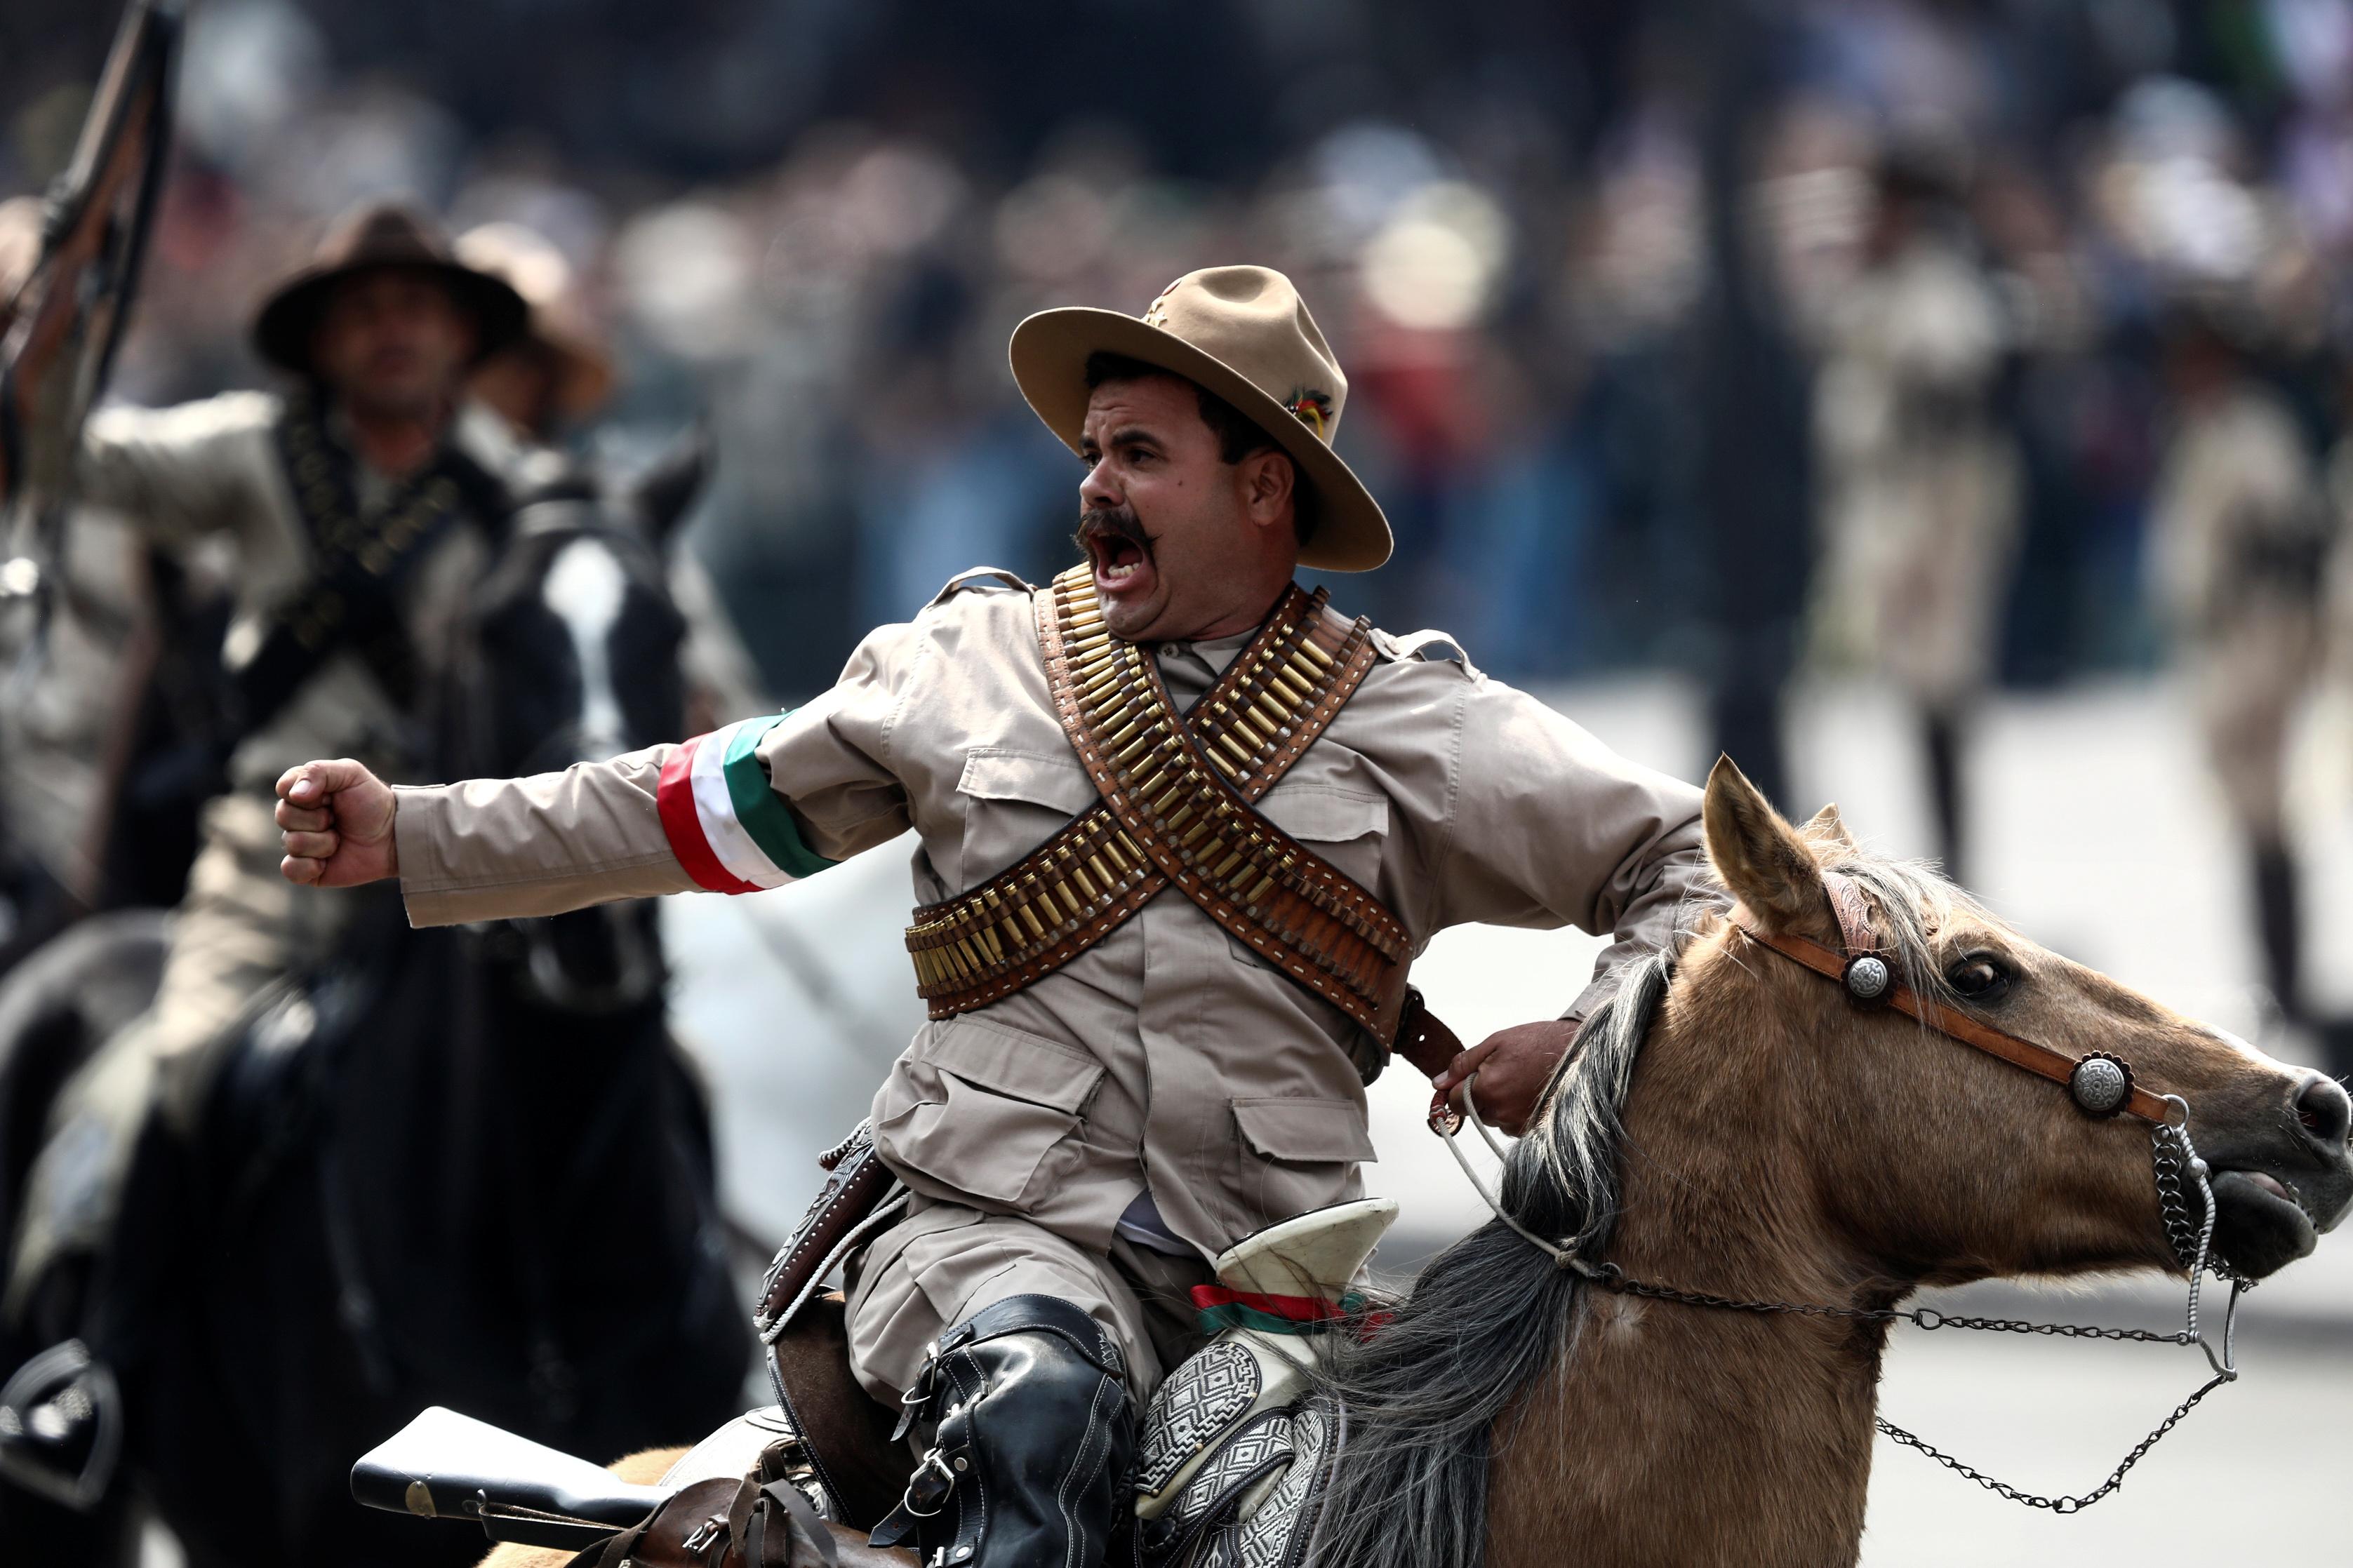 ( Foto: REUTERS/Edgard Garrido)